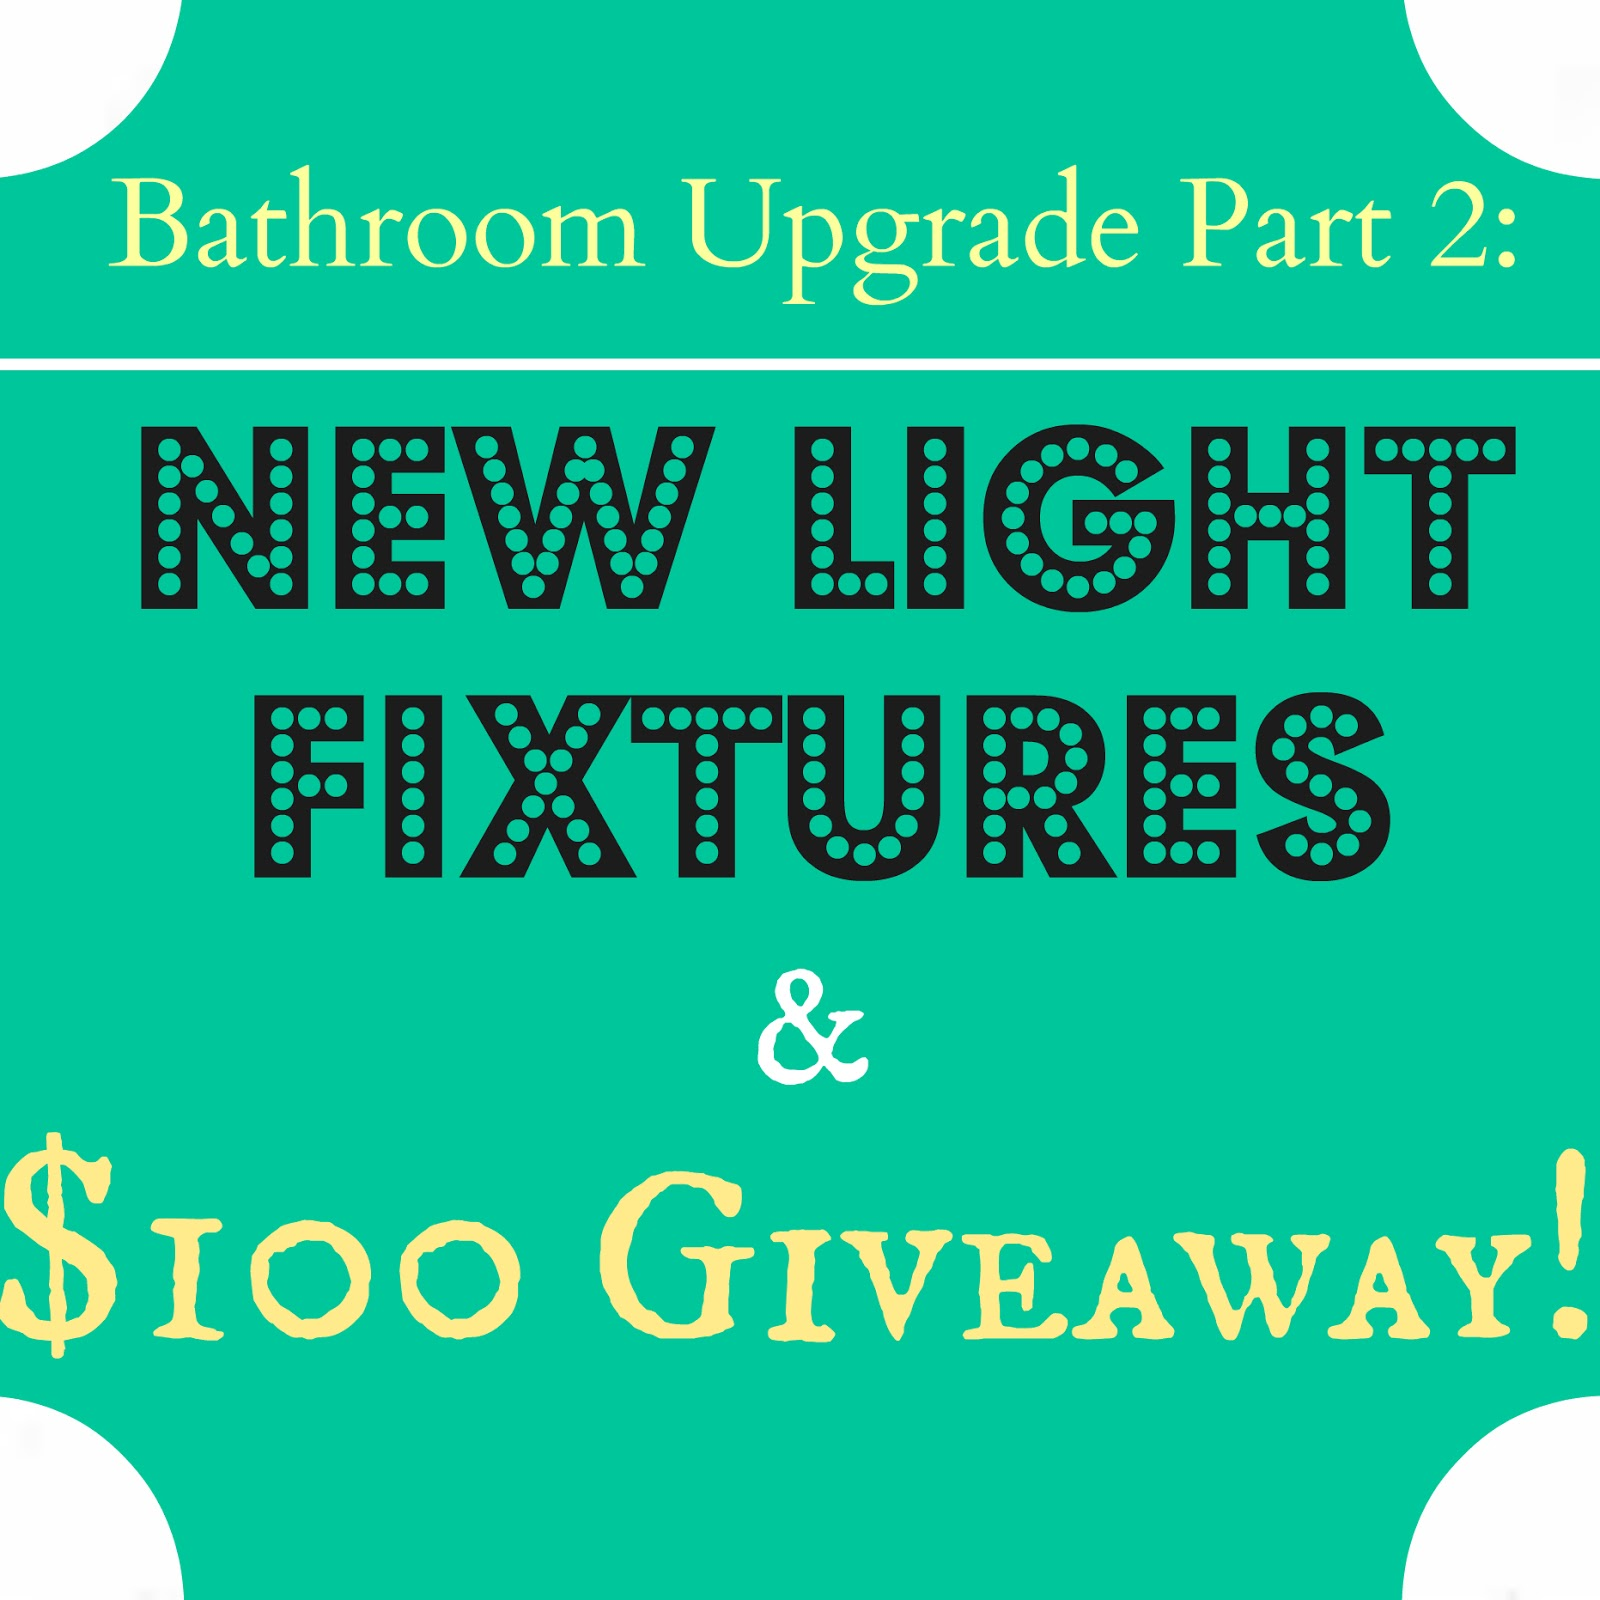 Bathroom Upgrade Part 2: New Light Fixtures and $100 GIVEAWAY ...